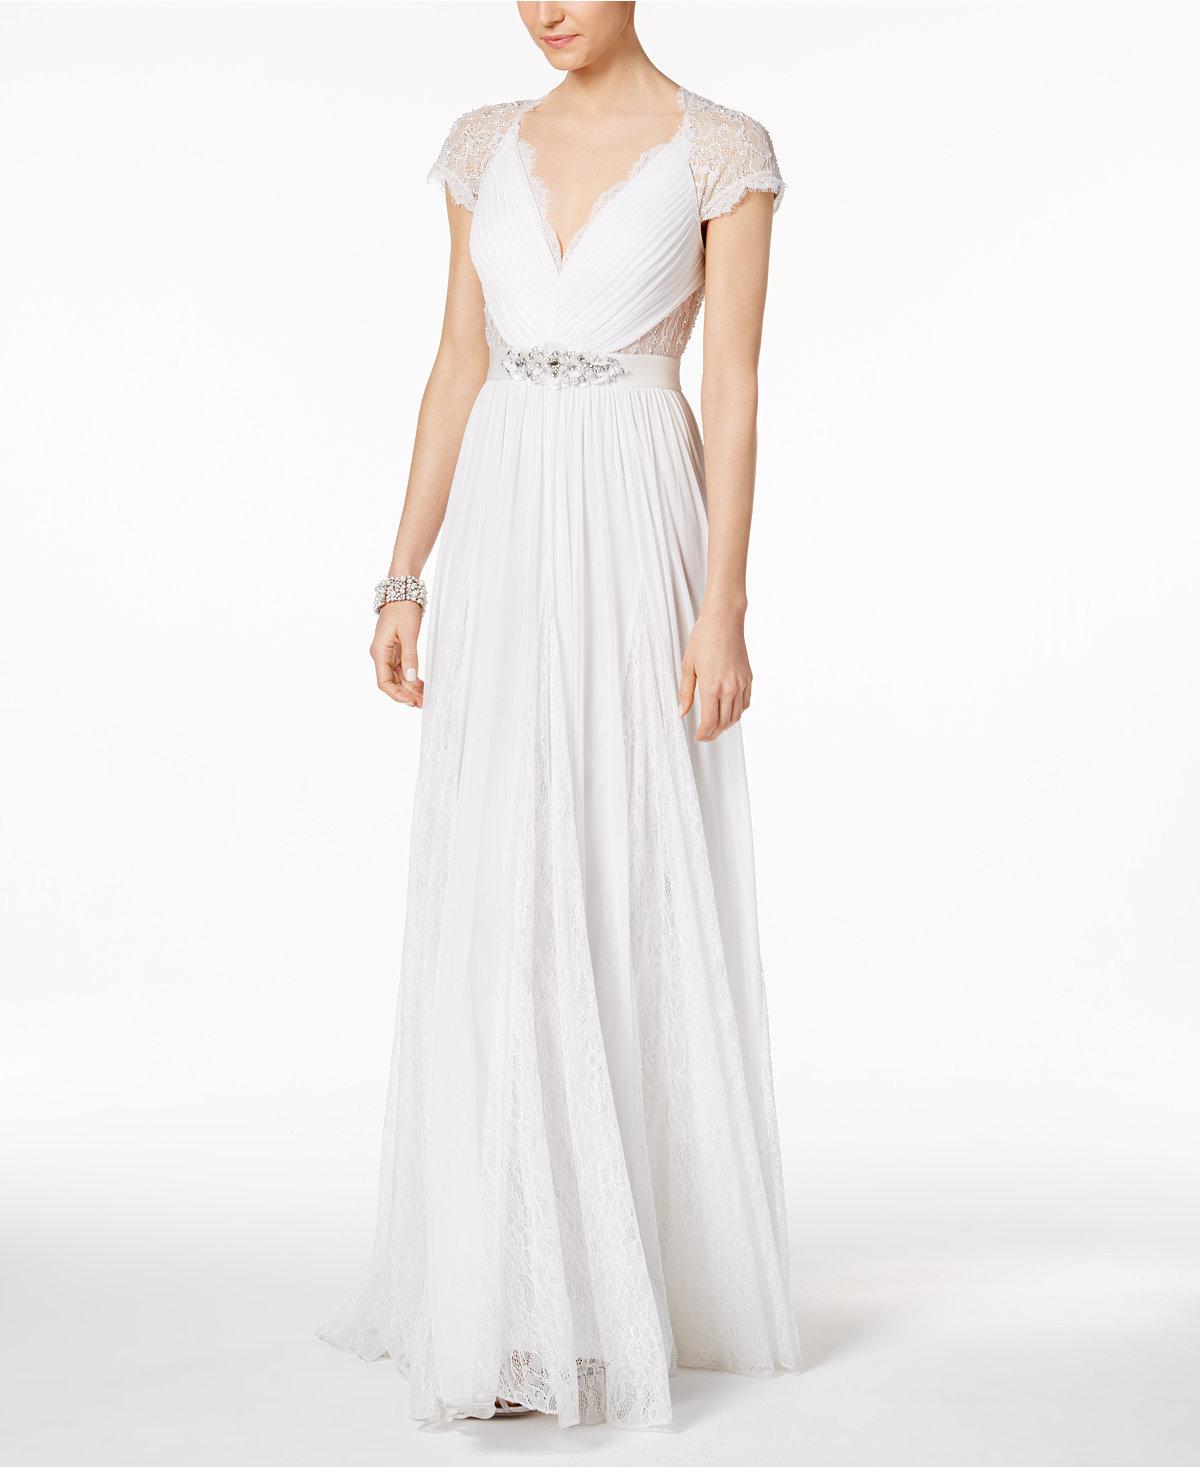 Inside elisabeth murdoch and keith tyson 39 s lavish wedding Wedding dress design courses uk